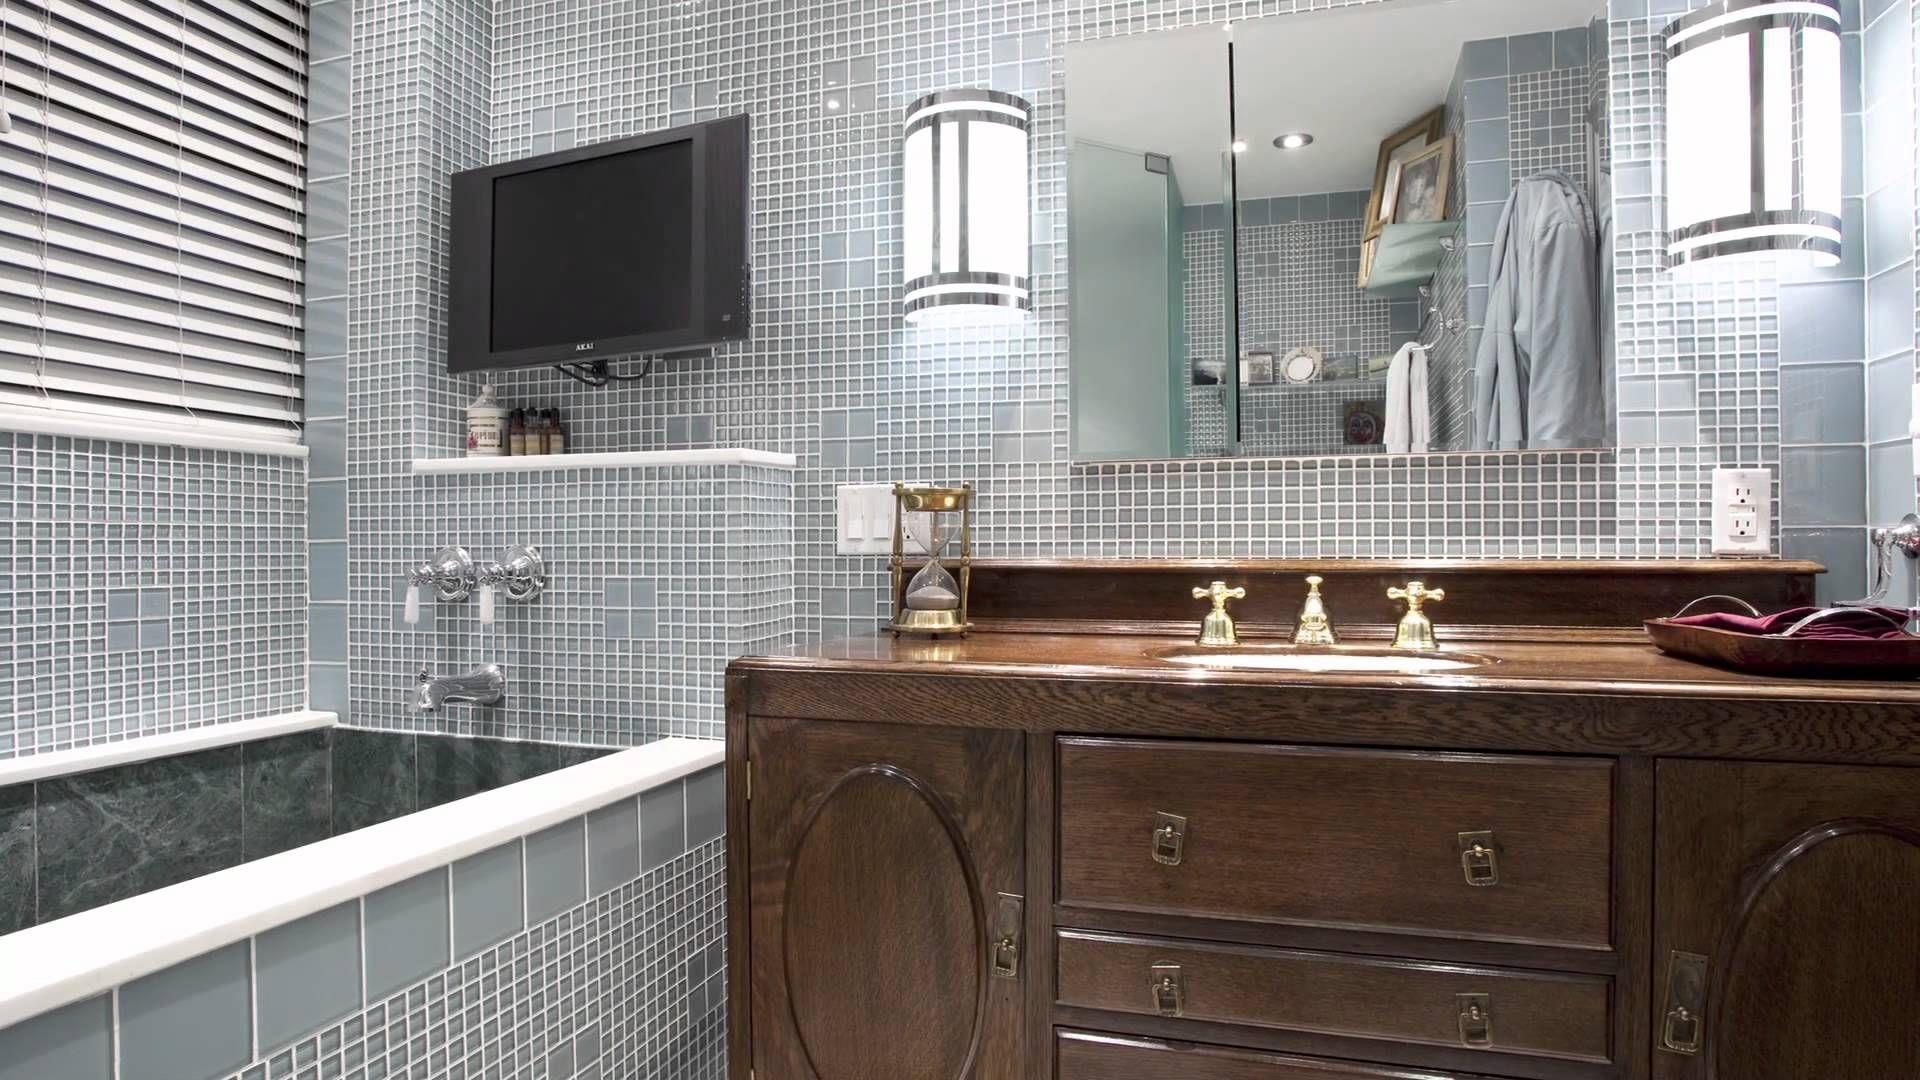 30 Great Pictures And Ideas Art Nouveau Bathroom Tiles Art Deco Bathroom Vanity Bathroom Tile Designs Art Deco Bathroom